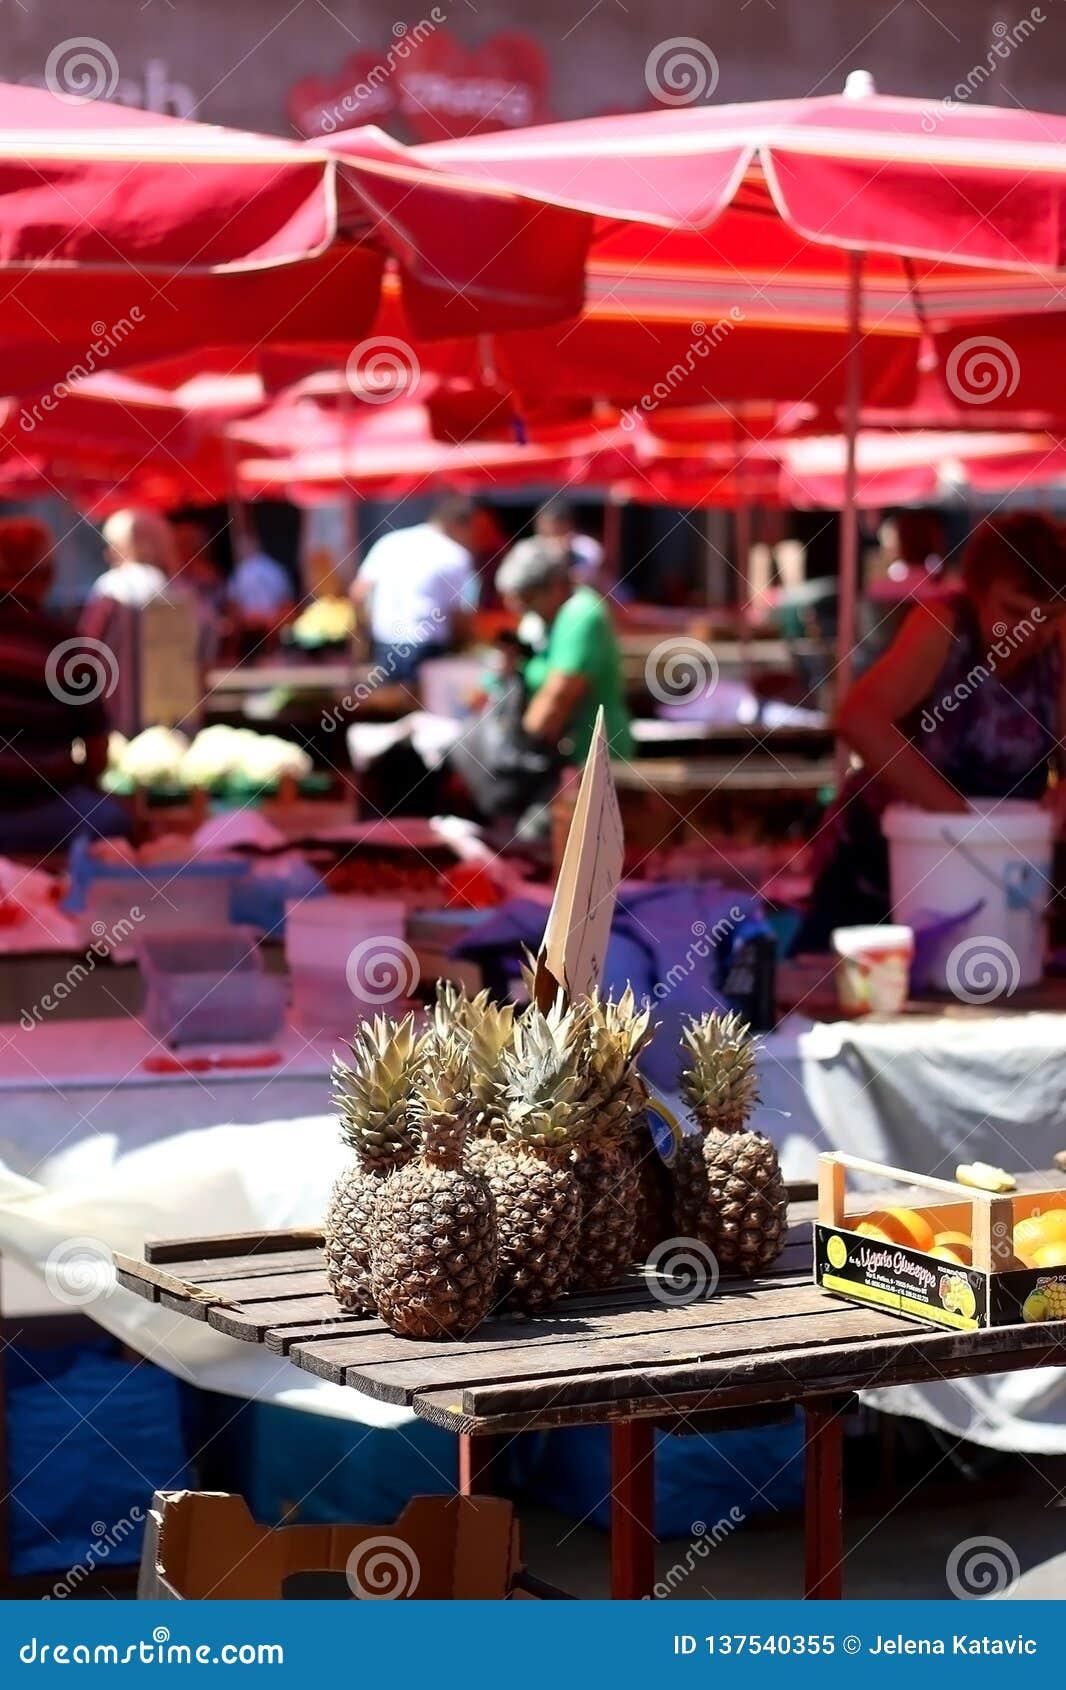 Dolac市场,萨格勒布,克罗地亚